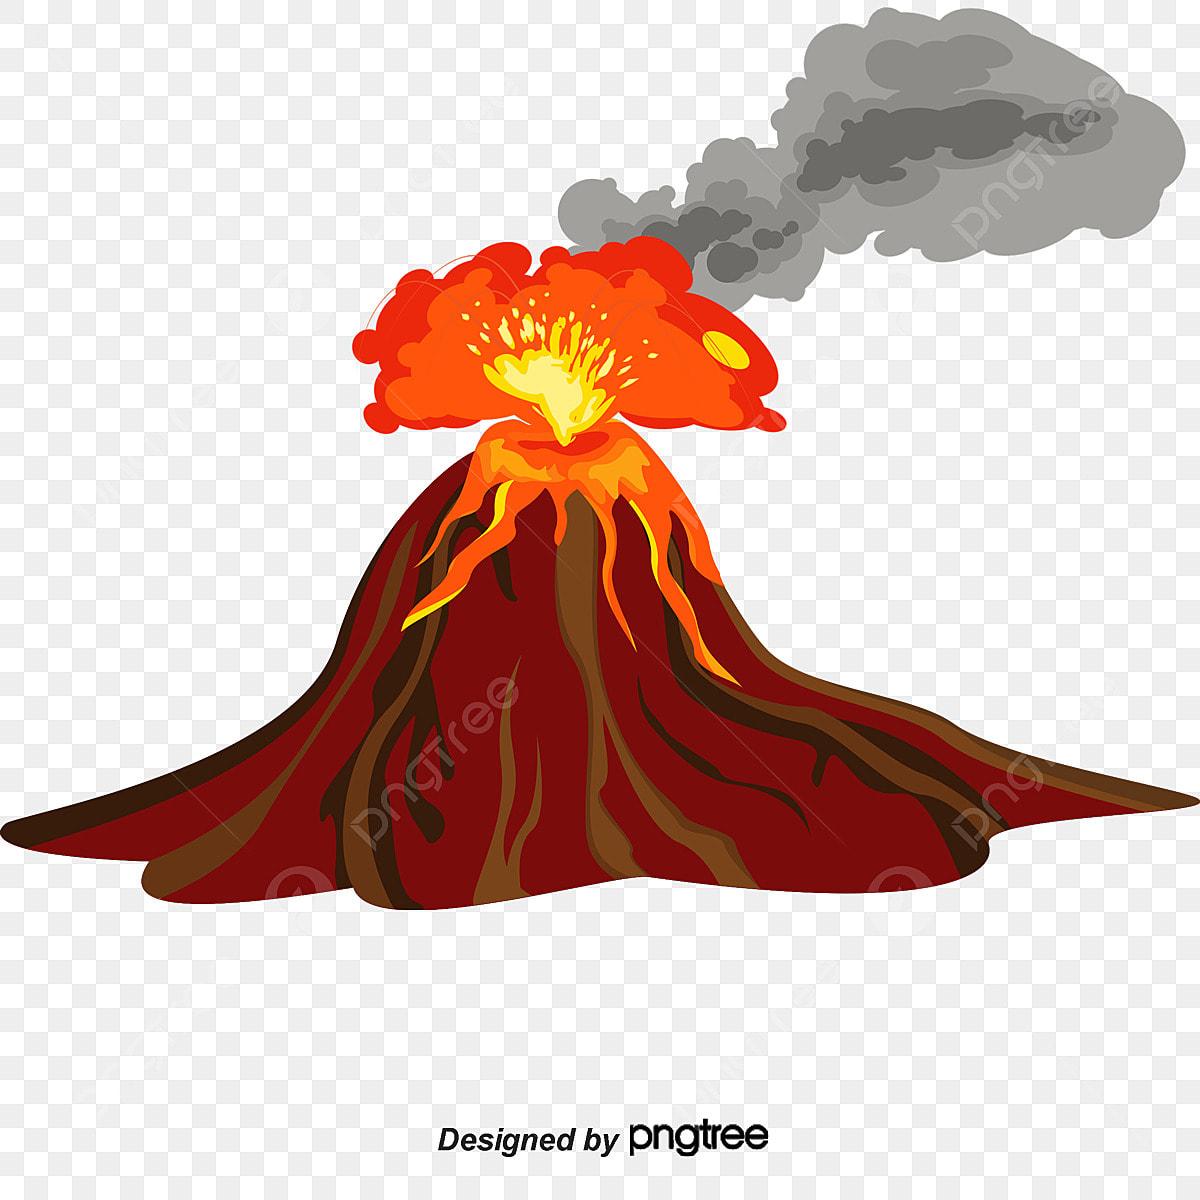 Transparent Volcano Clipart - Transparent Background Volcano Png , Free  Transparent Clipart - ClipartKey